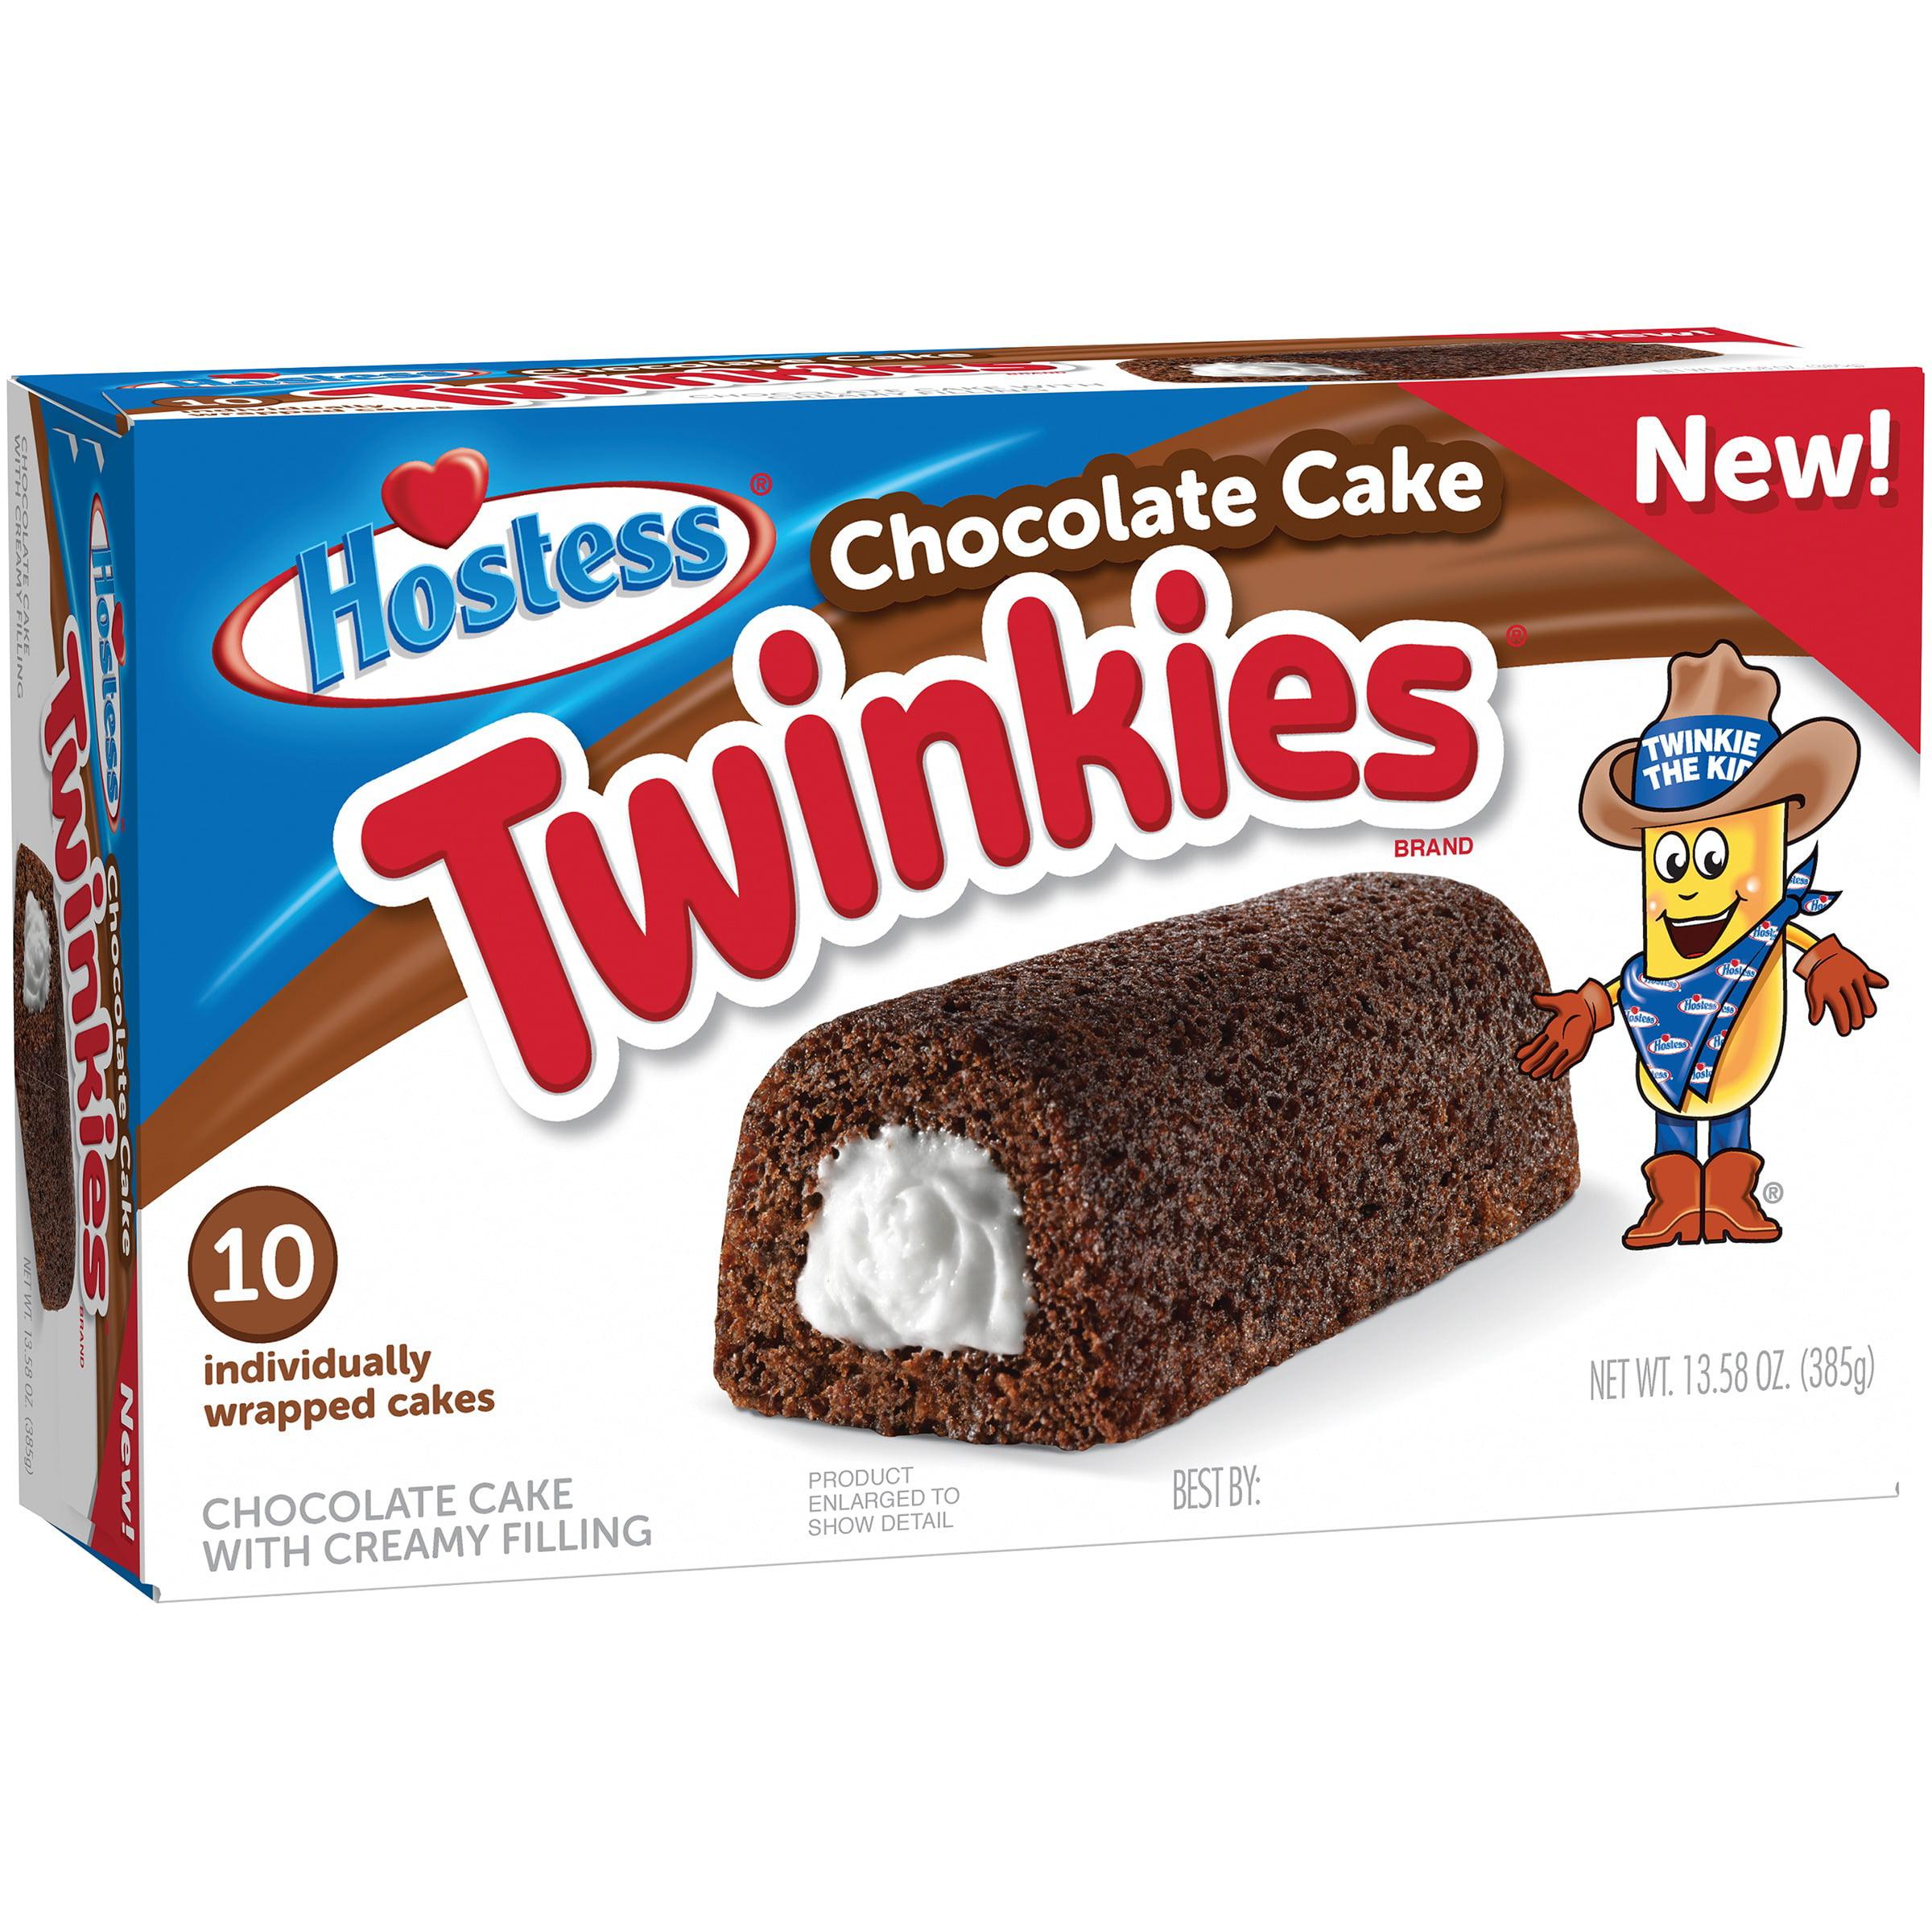 Hostess Chocolate Cake Twinkies, 10 ct, 13.58 oz